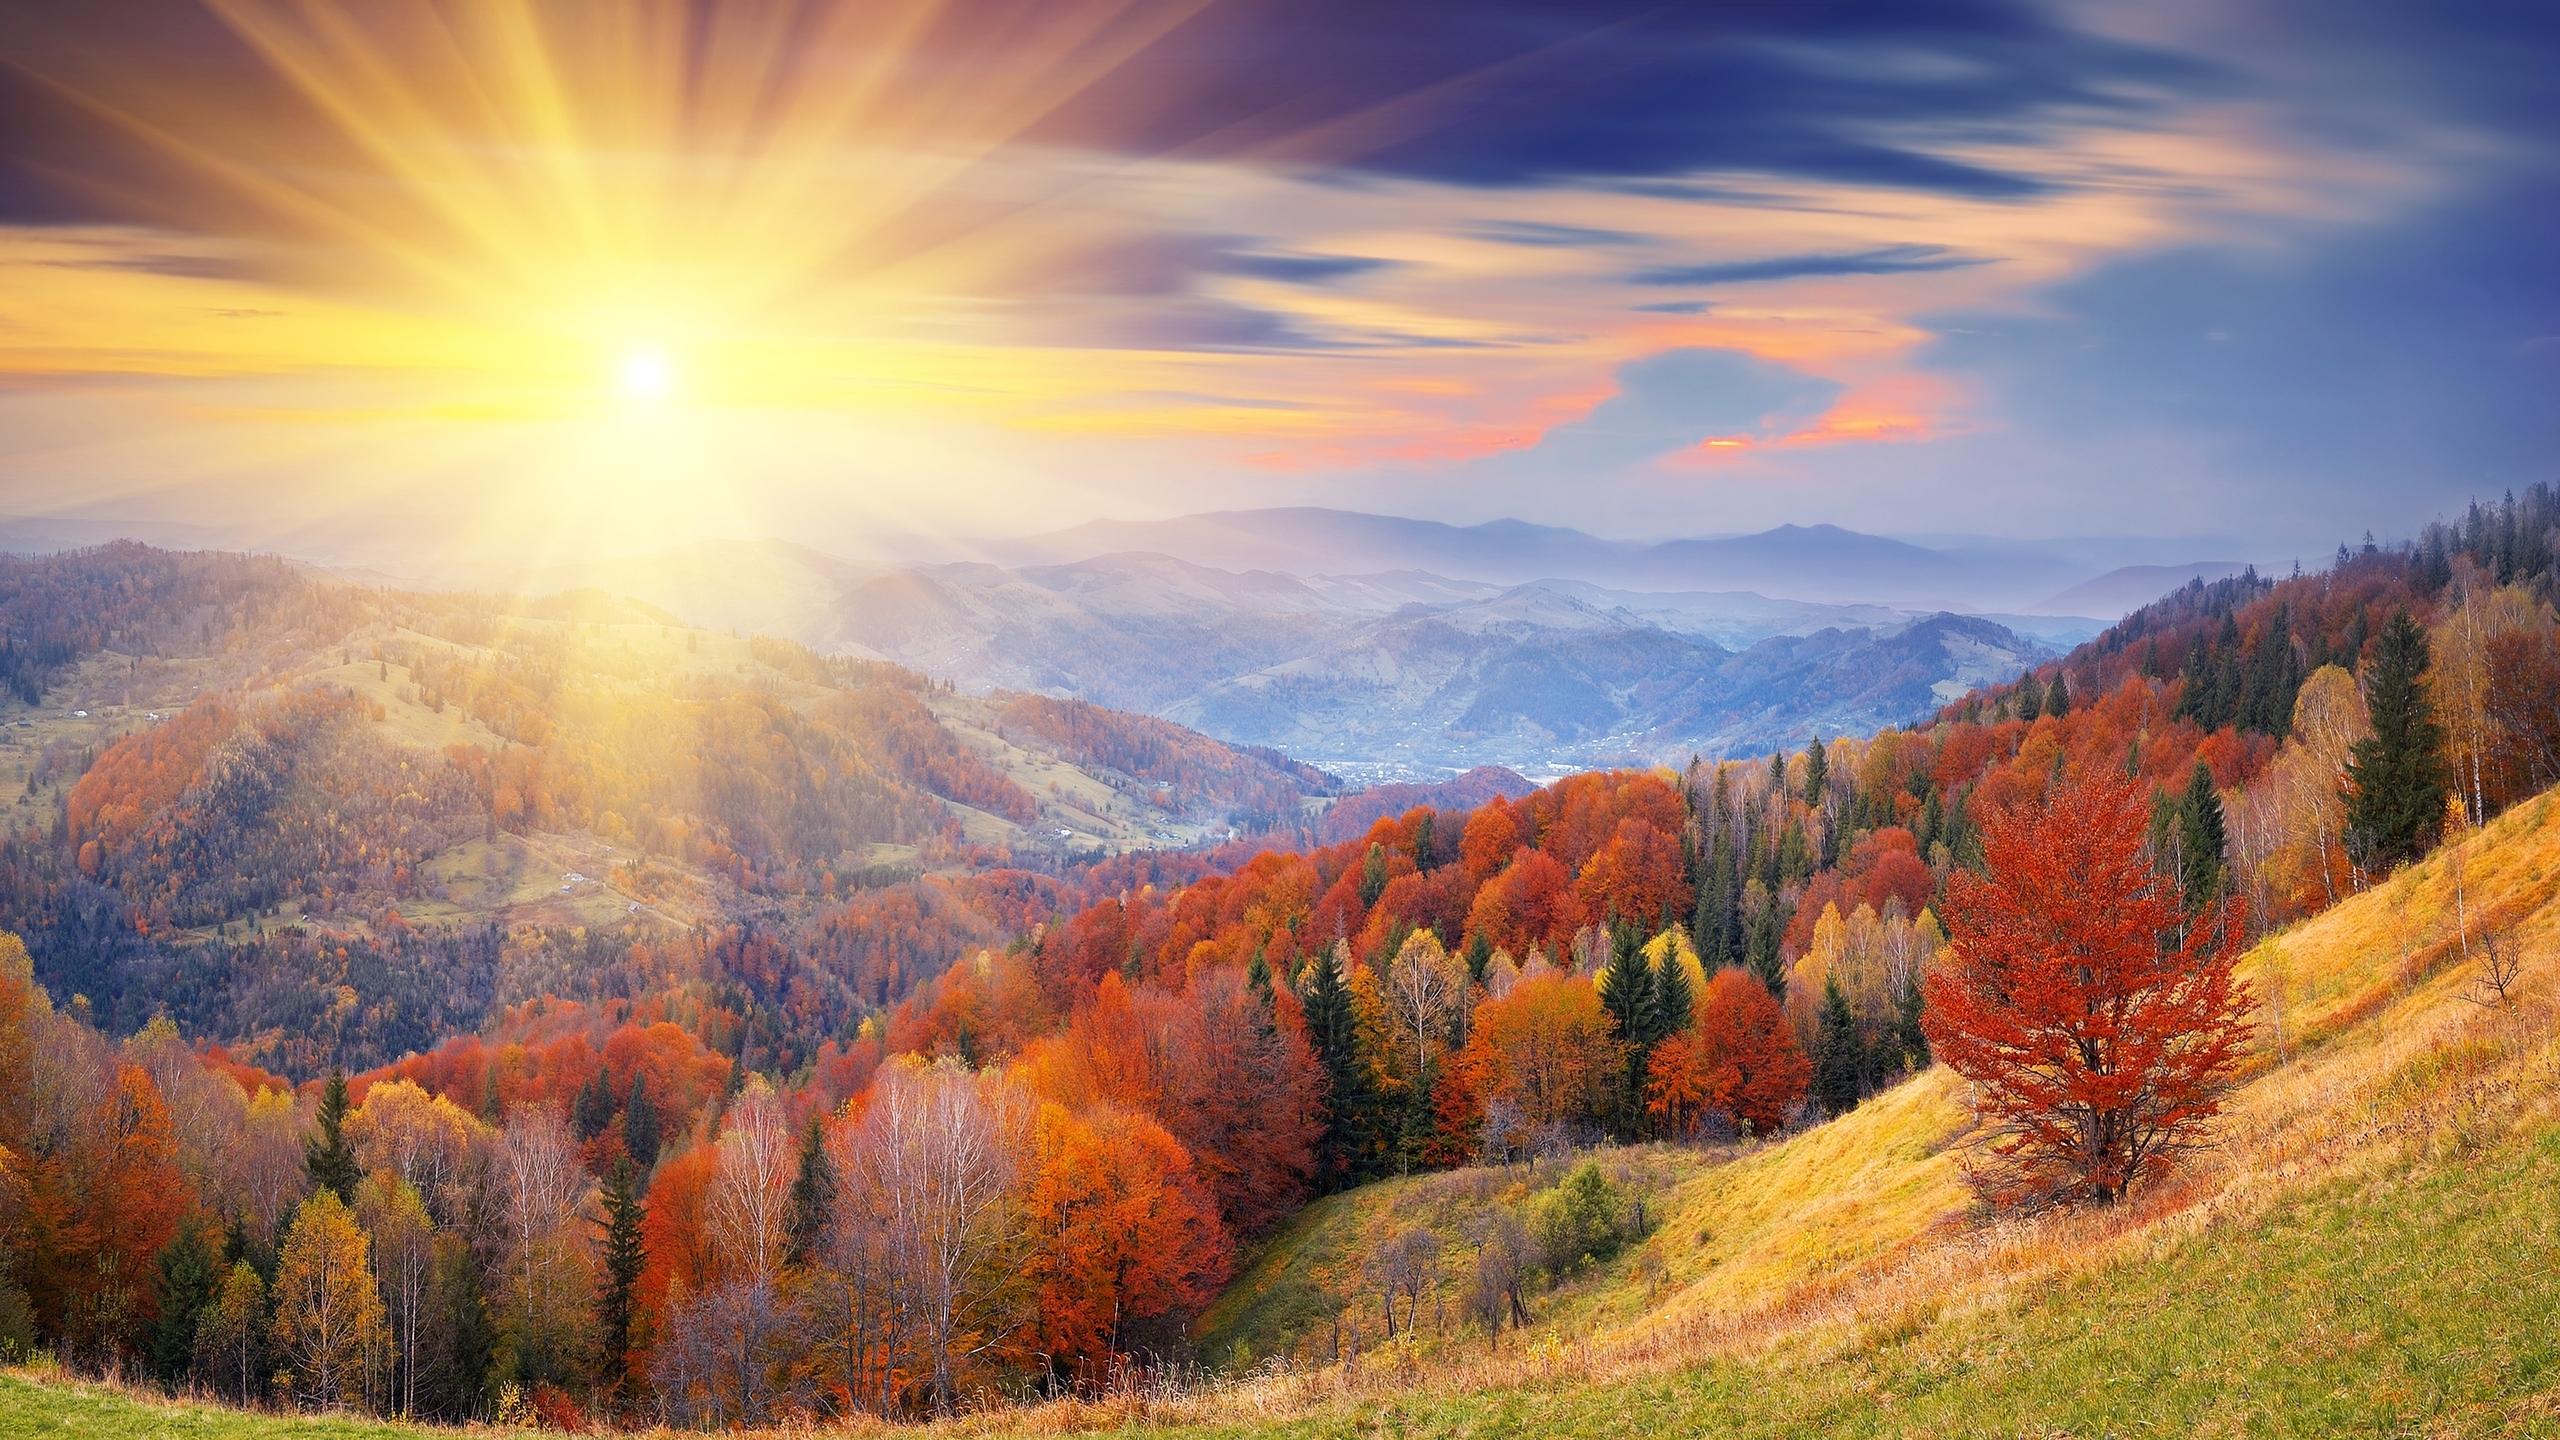 Un paesaggio con sole splendenteextra Wonderful Earth 2560x1440